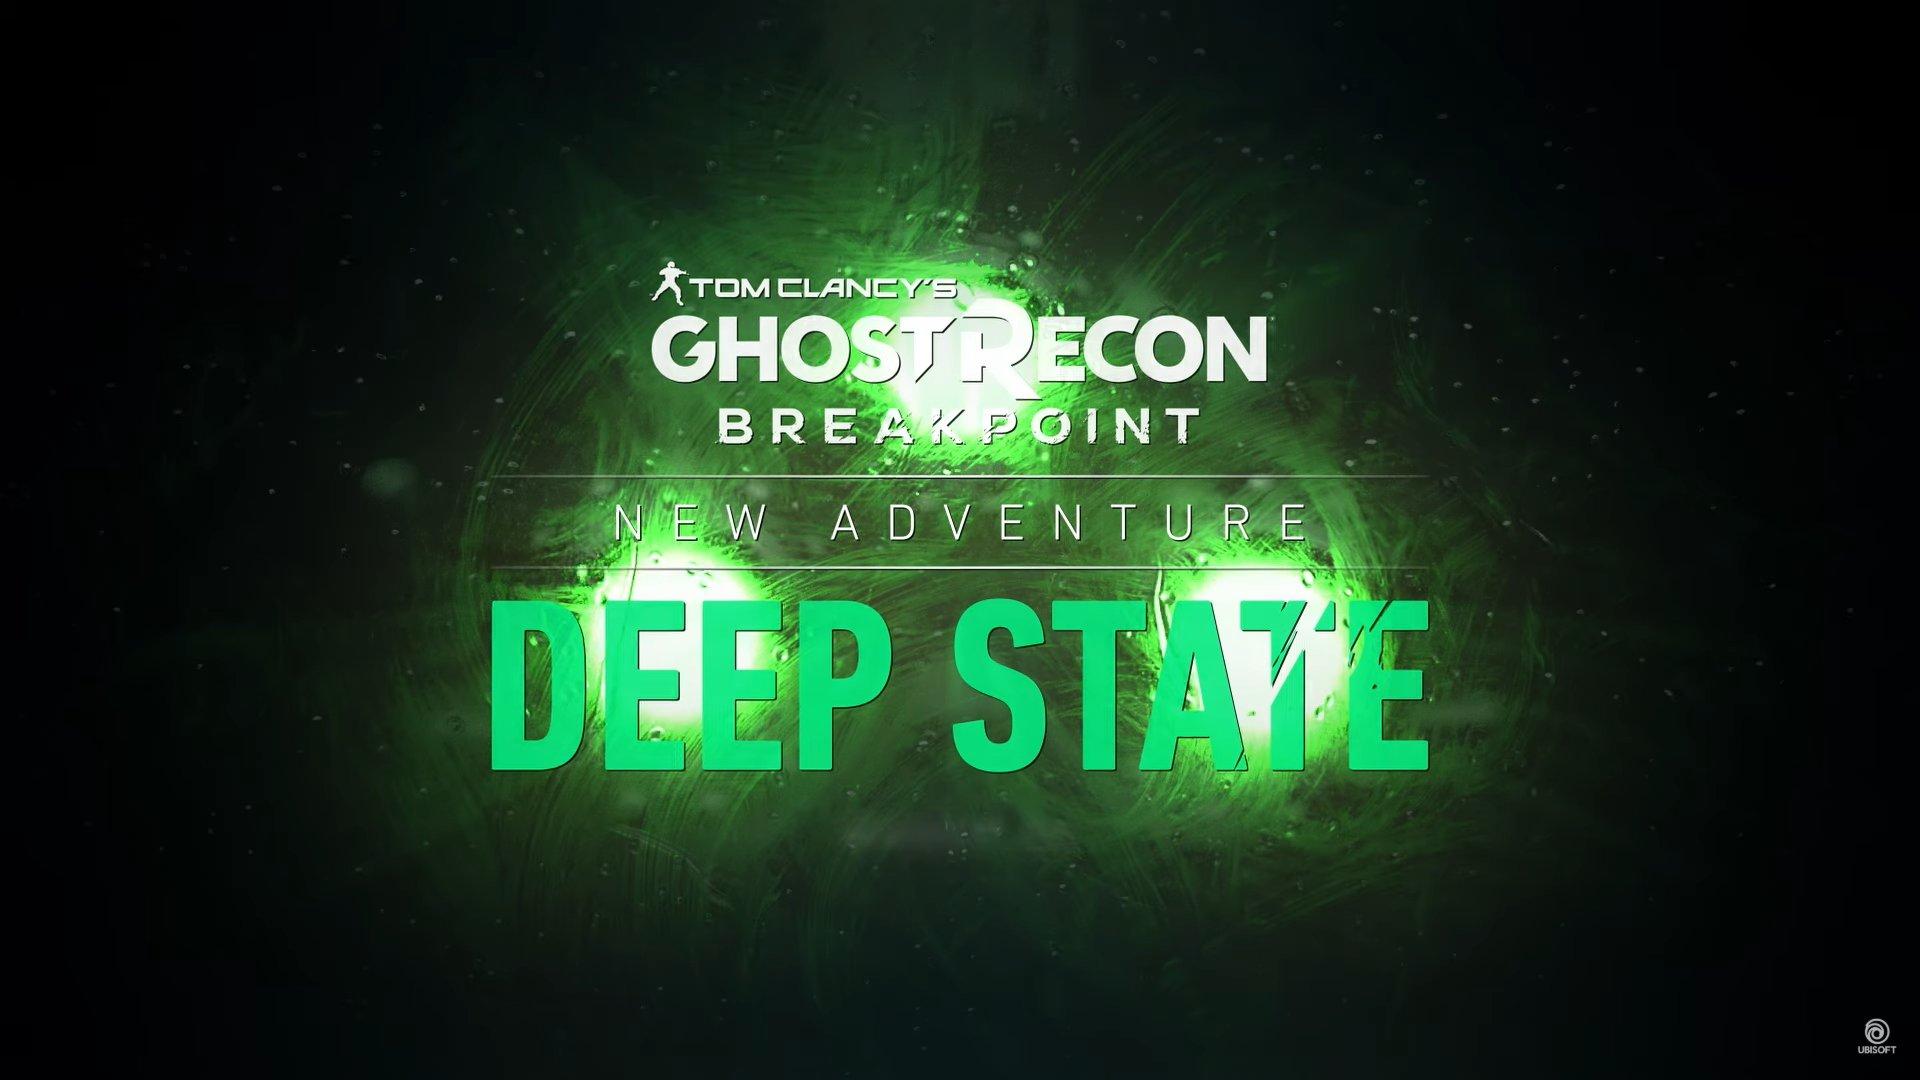 Сэм Фишер поможет «призракам» в новом дополнении к Ghost Recon Breakpoint